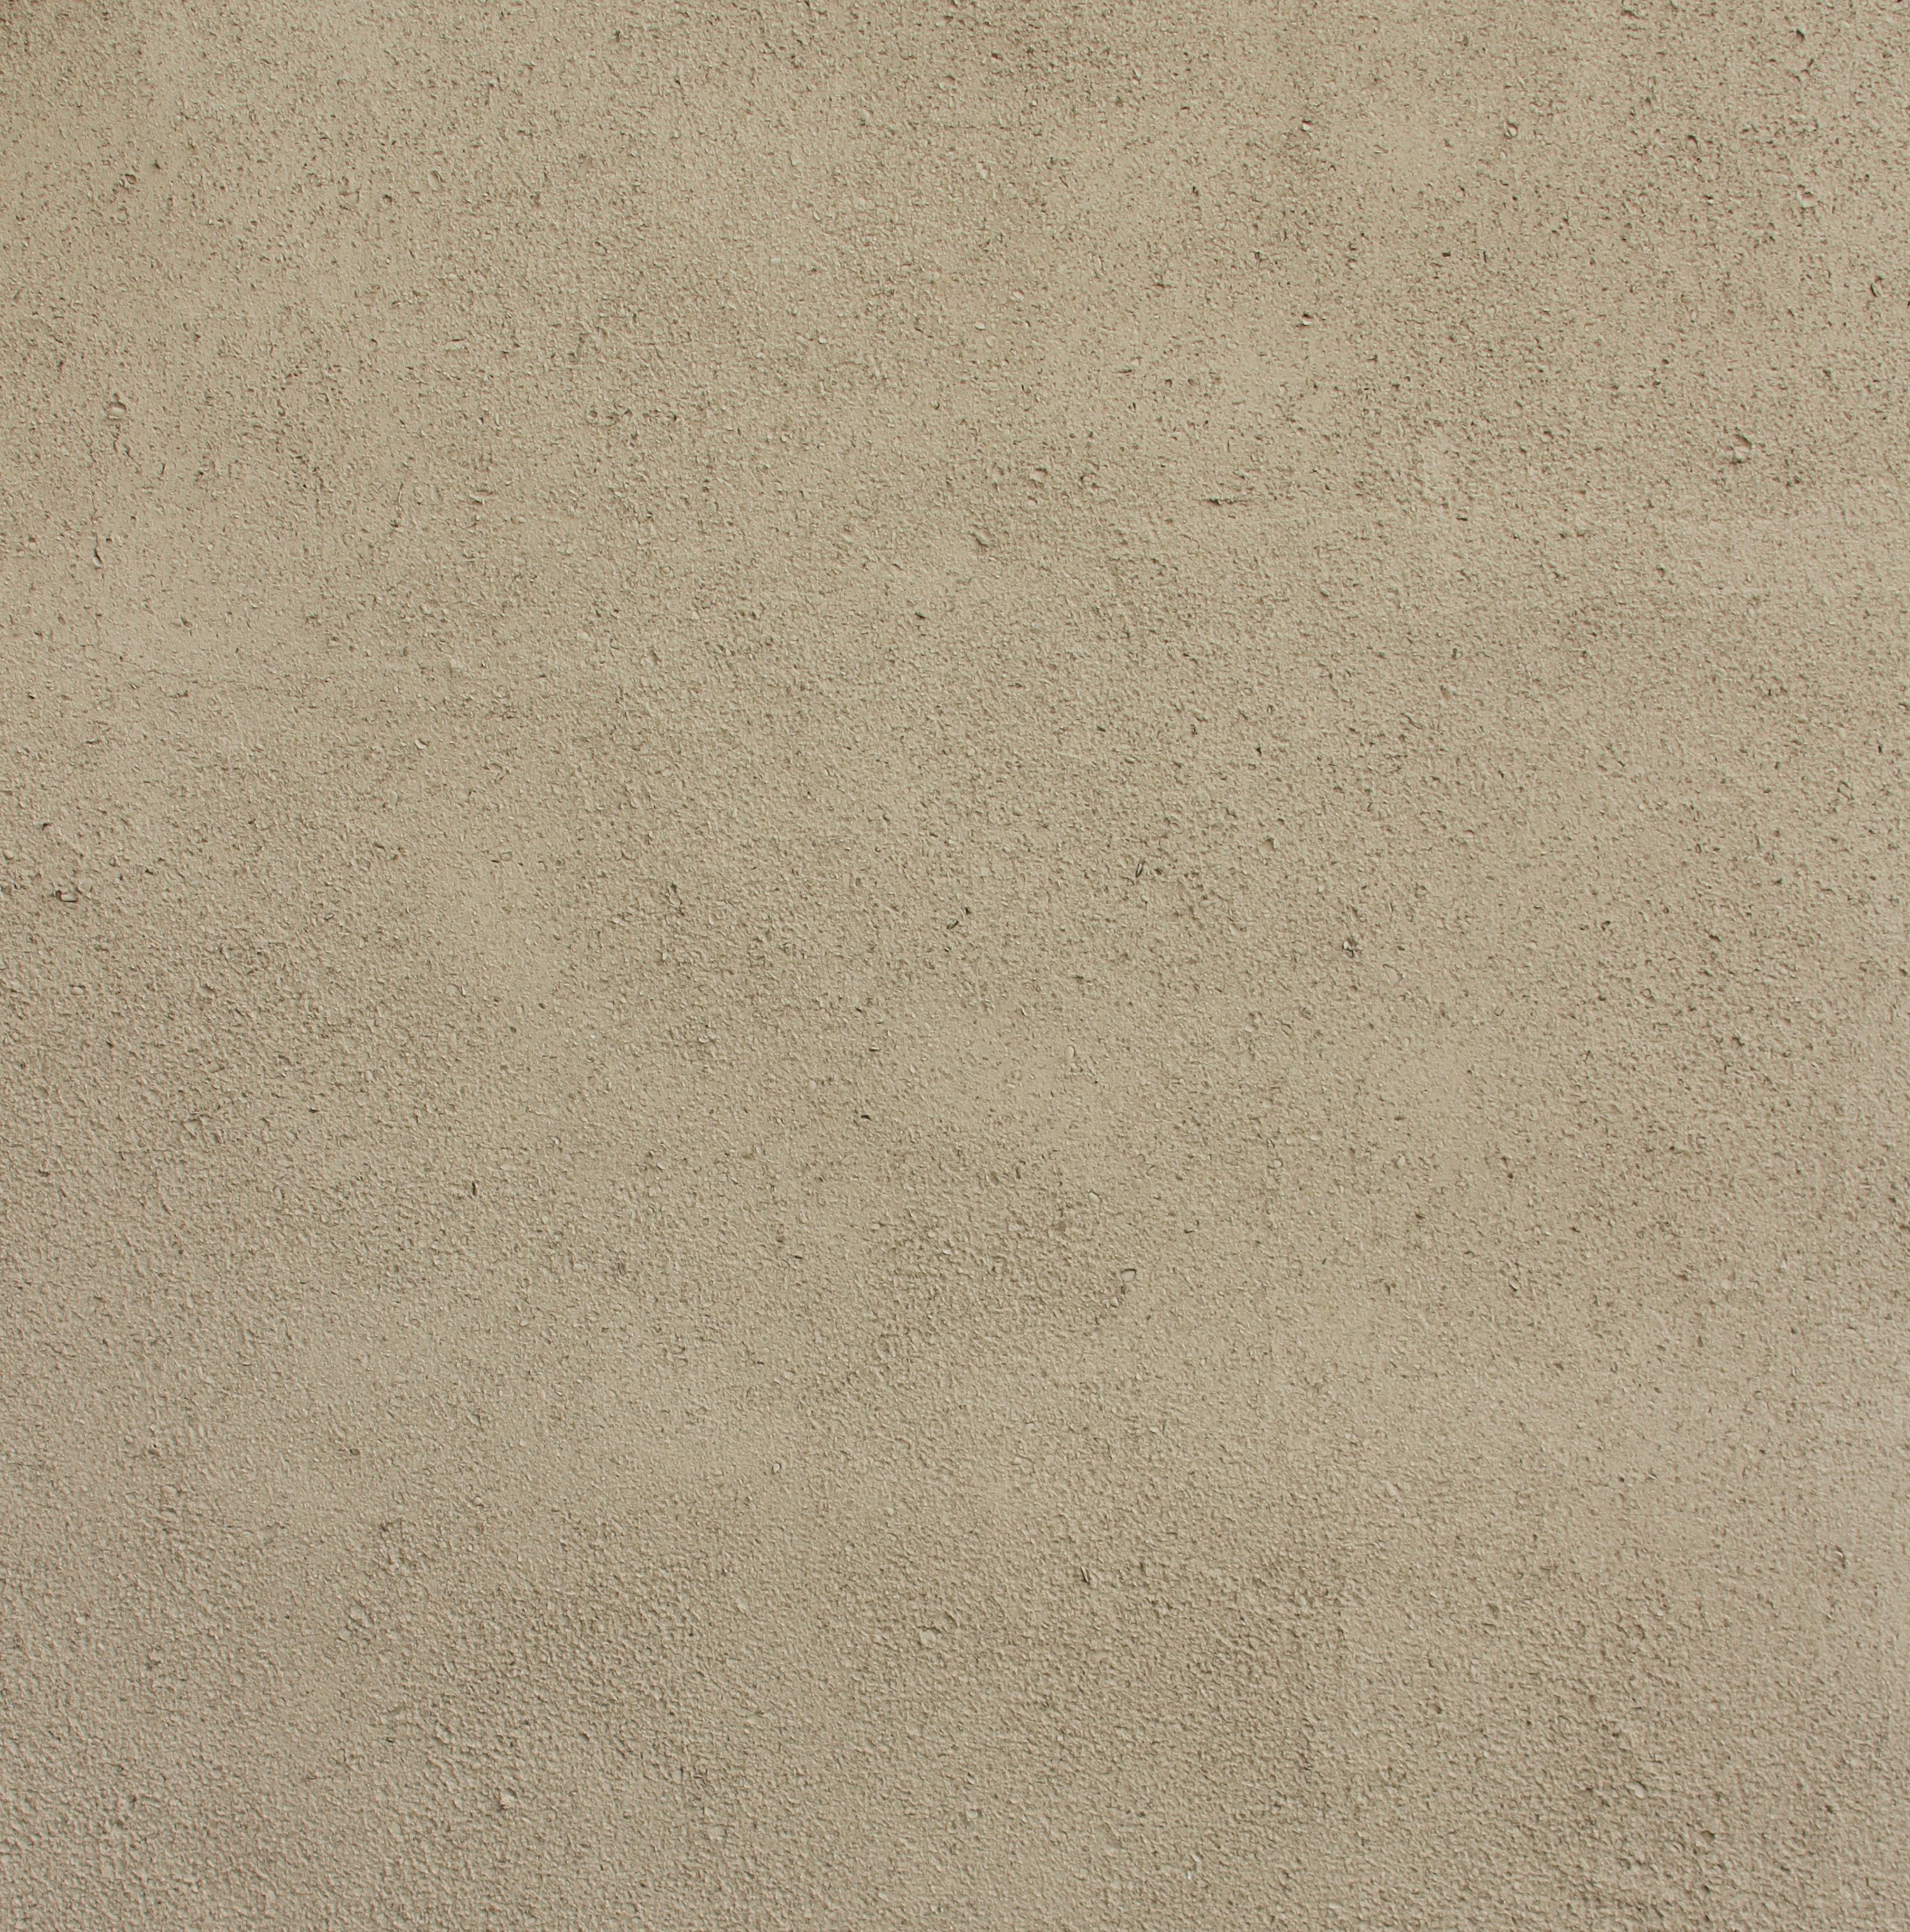 High Resolution Seamless Textures Free Seamless Stucco Wall. High ...